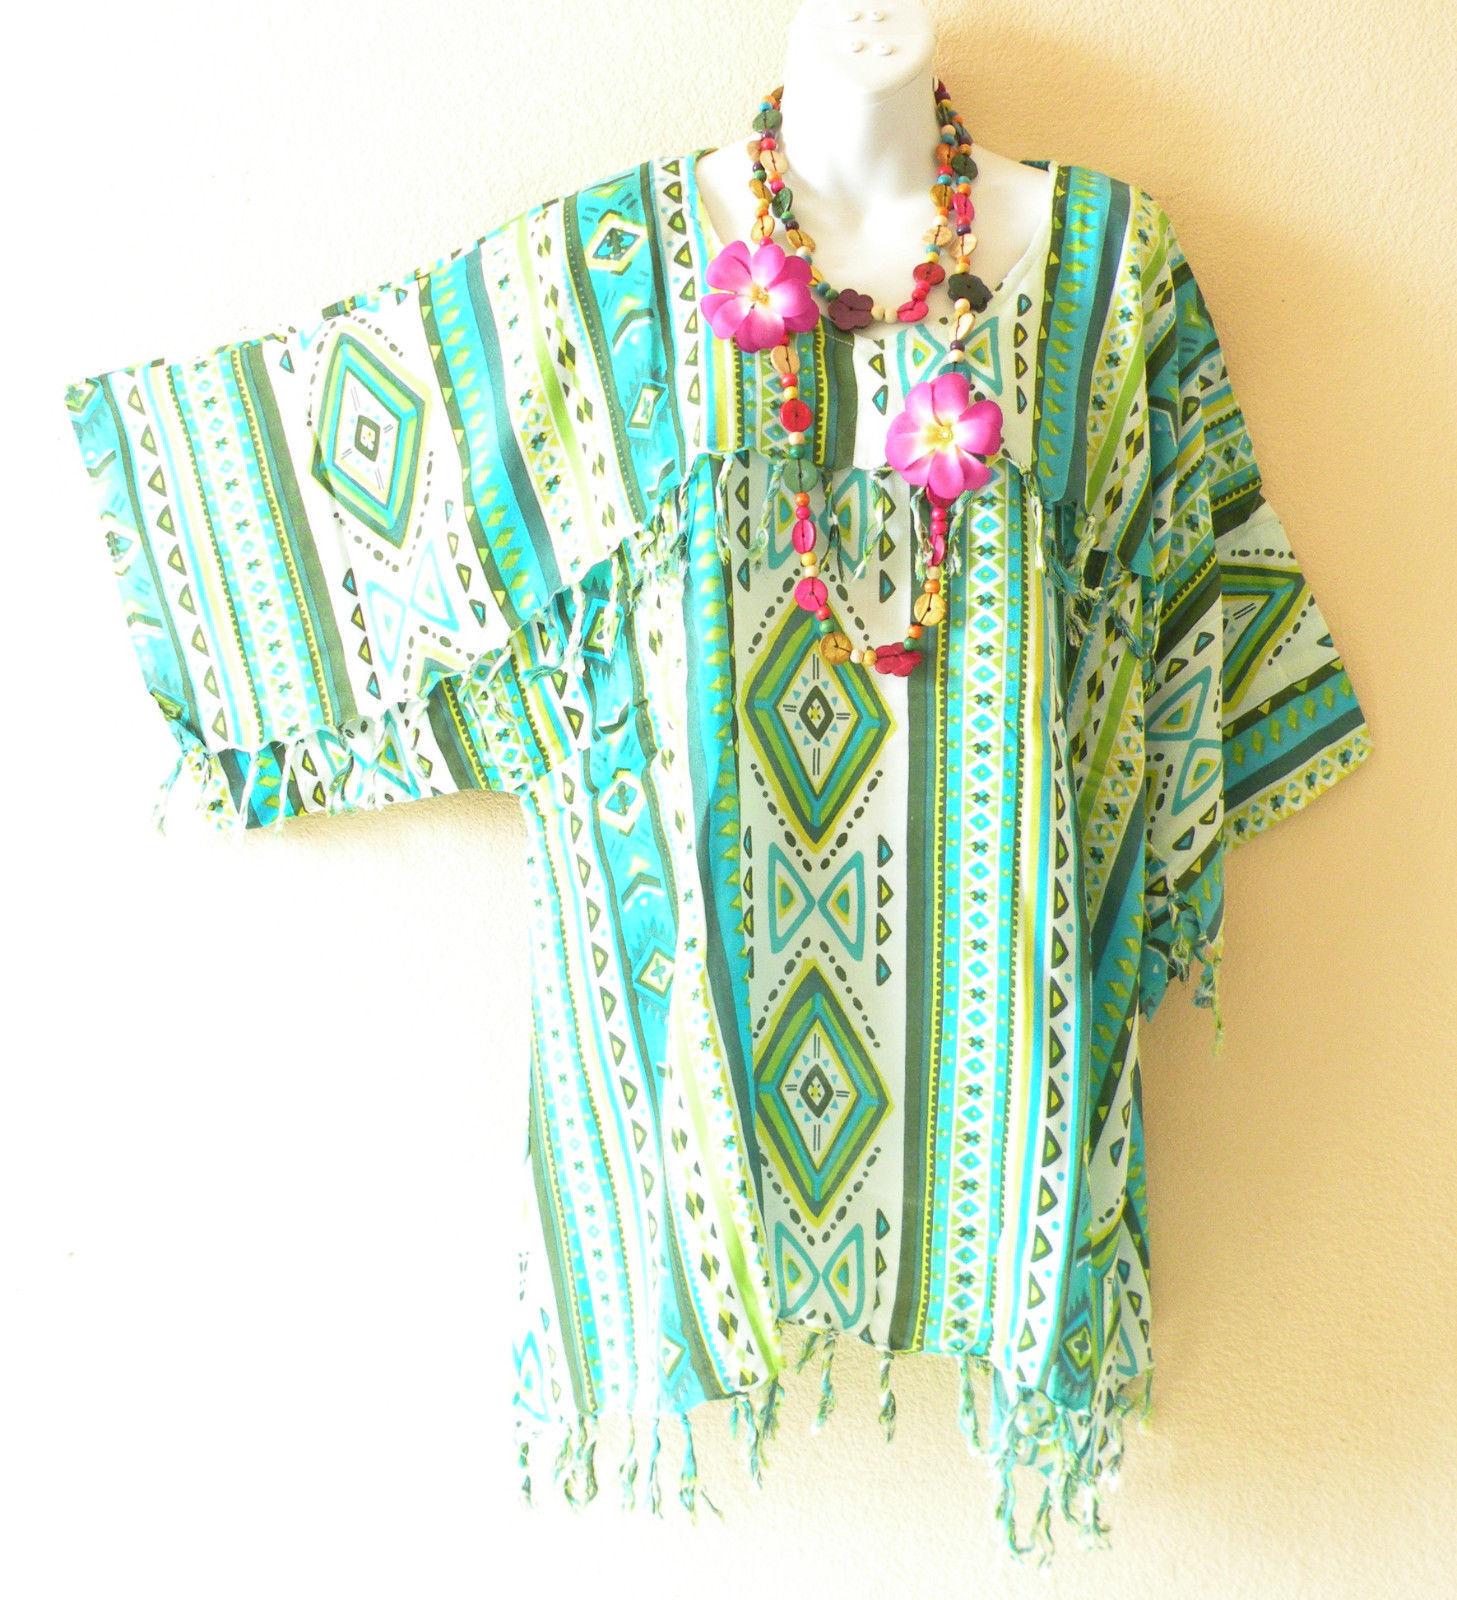 KB808 Green Caftan Poncho Kimono Tassel Tunic Fringe Blouse Top -L, XL, 1X & 2X